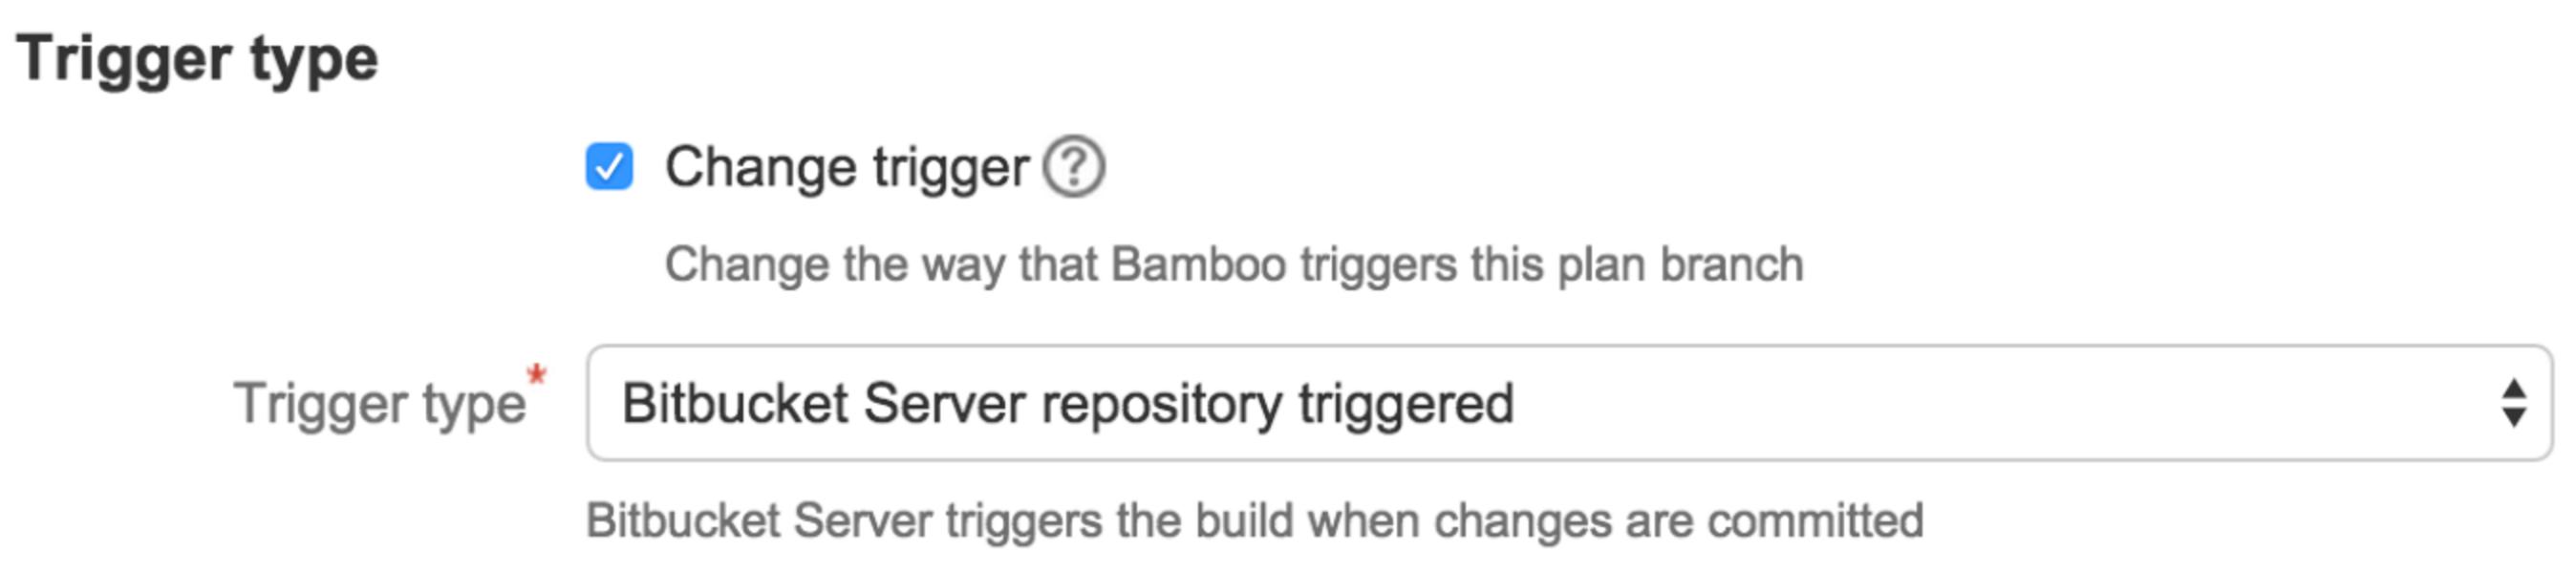 Bitbucket Trigger